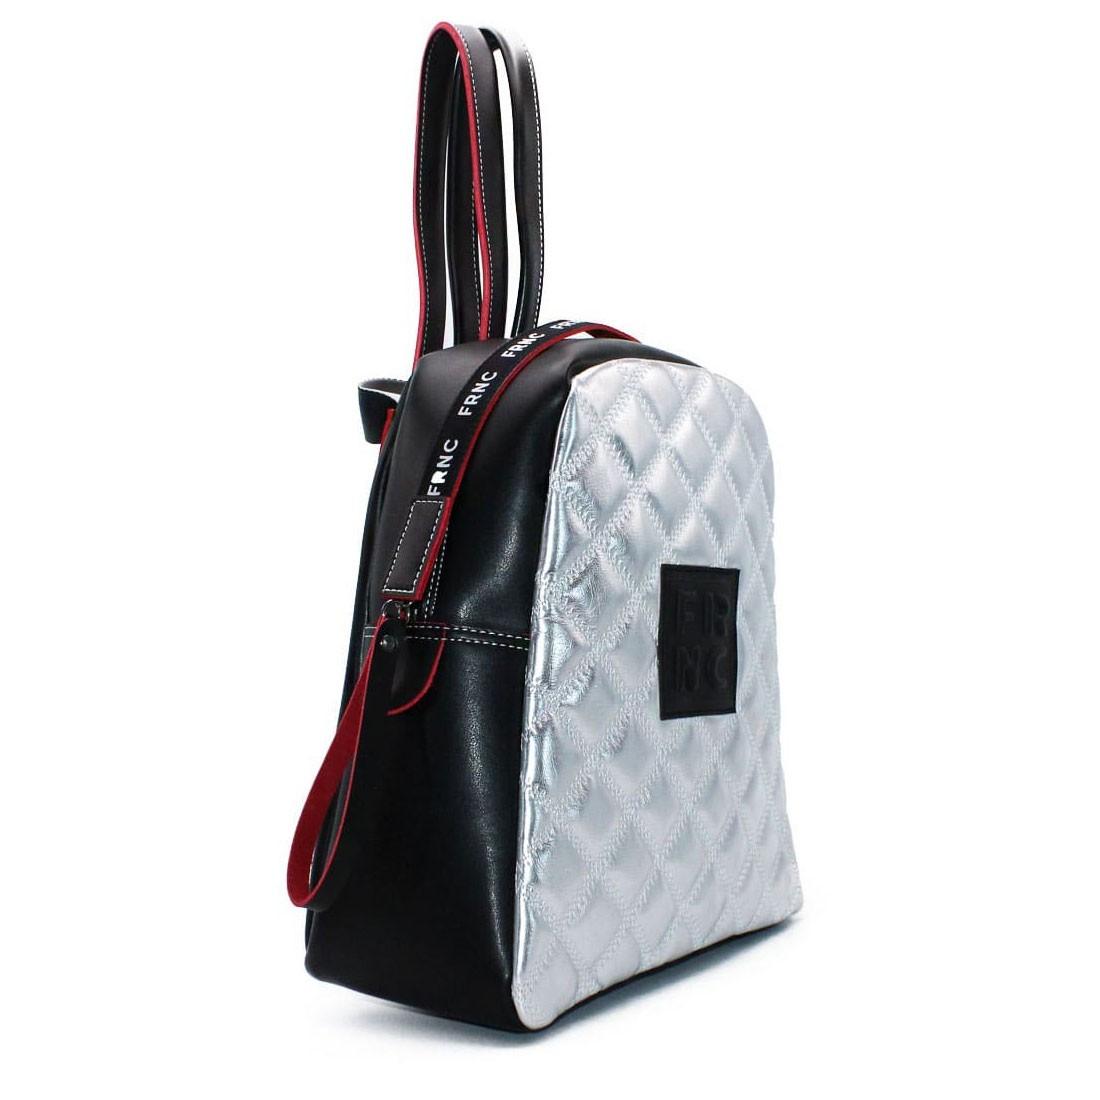 494d543abe FRNC FRANCESCO Τσάντα Γυναικεία Πλάτης-Backpack 1202 Μαύρο-Ασημί Kαπιτονέ –  IShoeStore